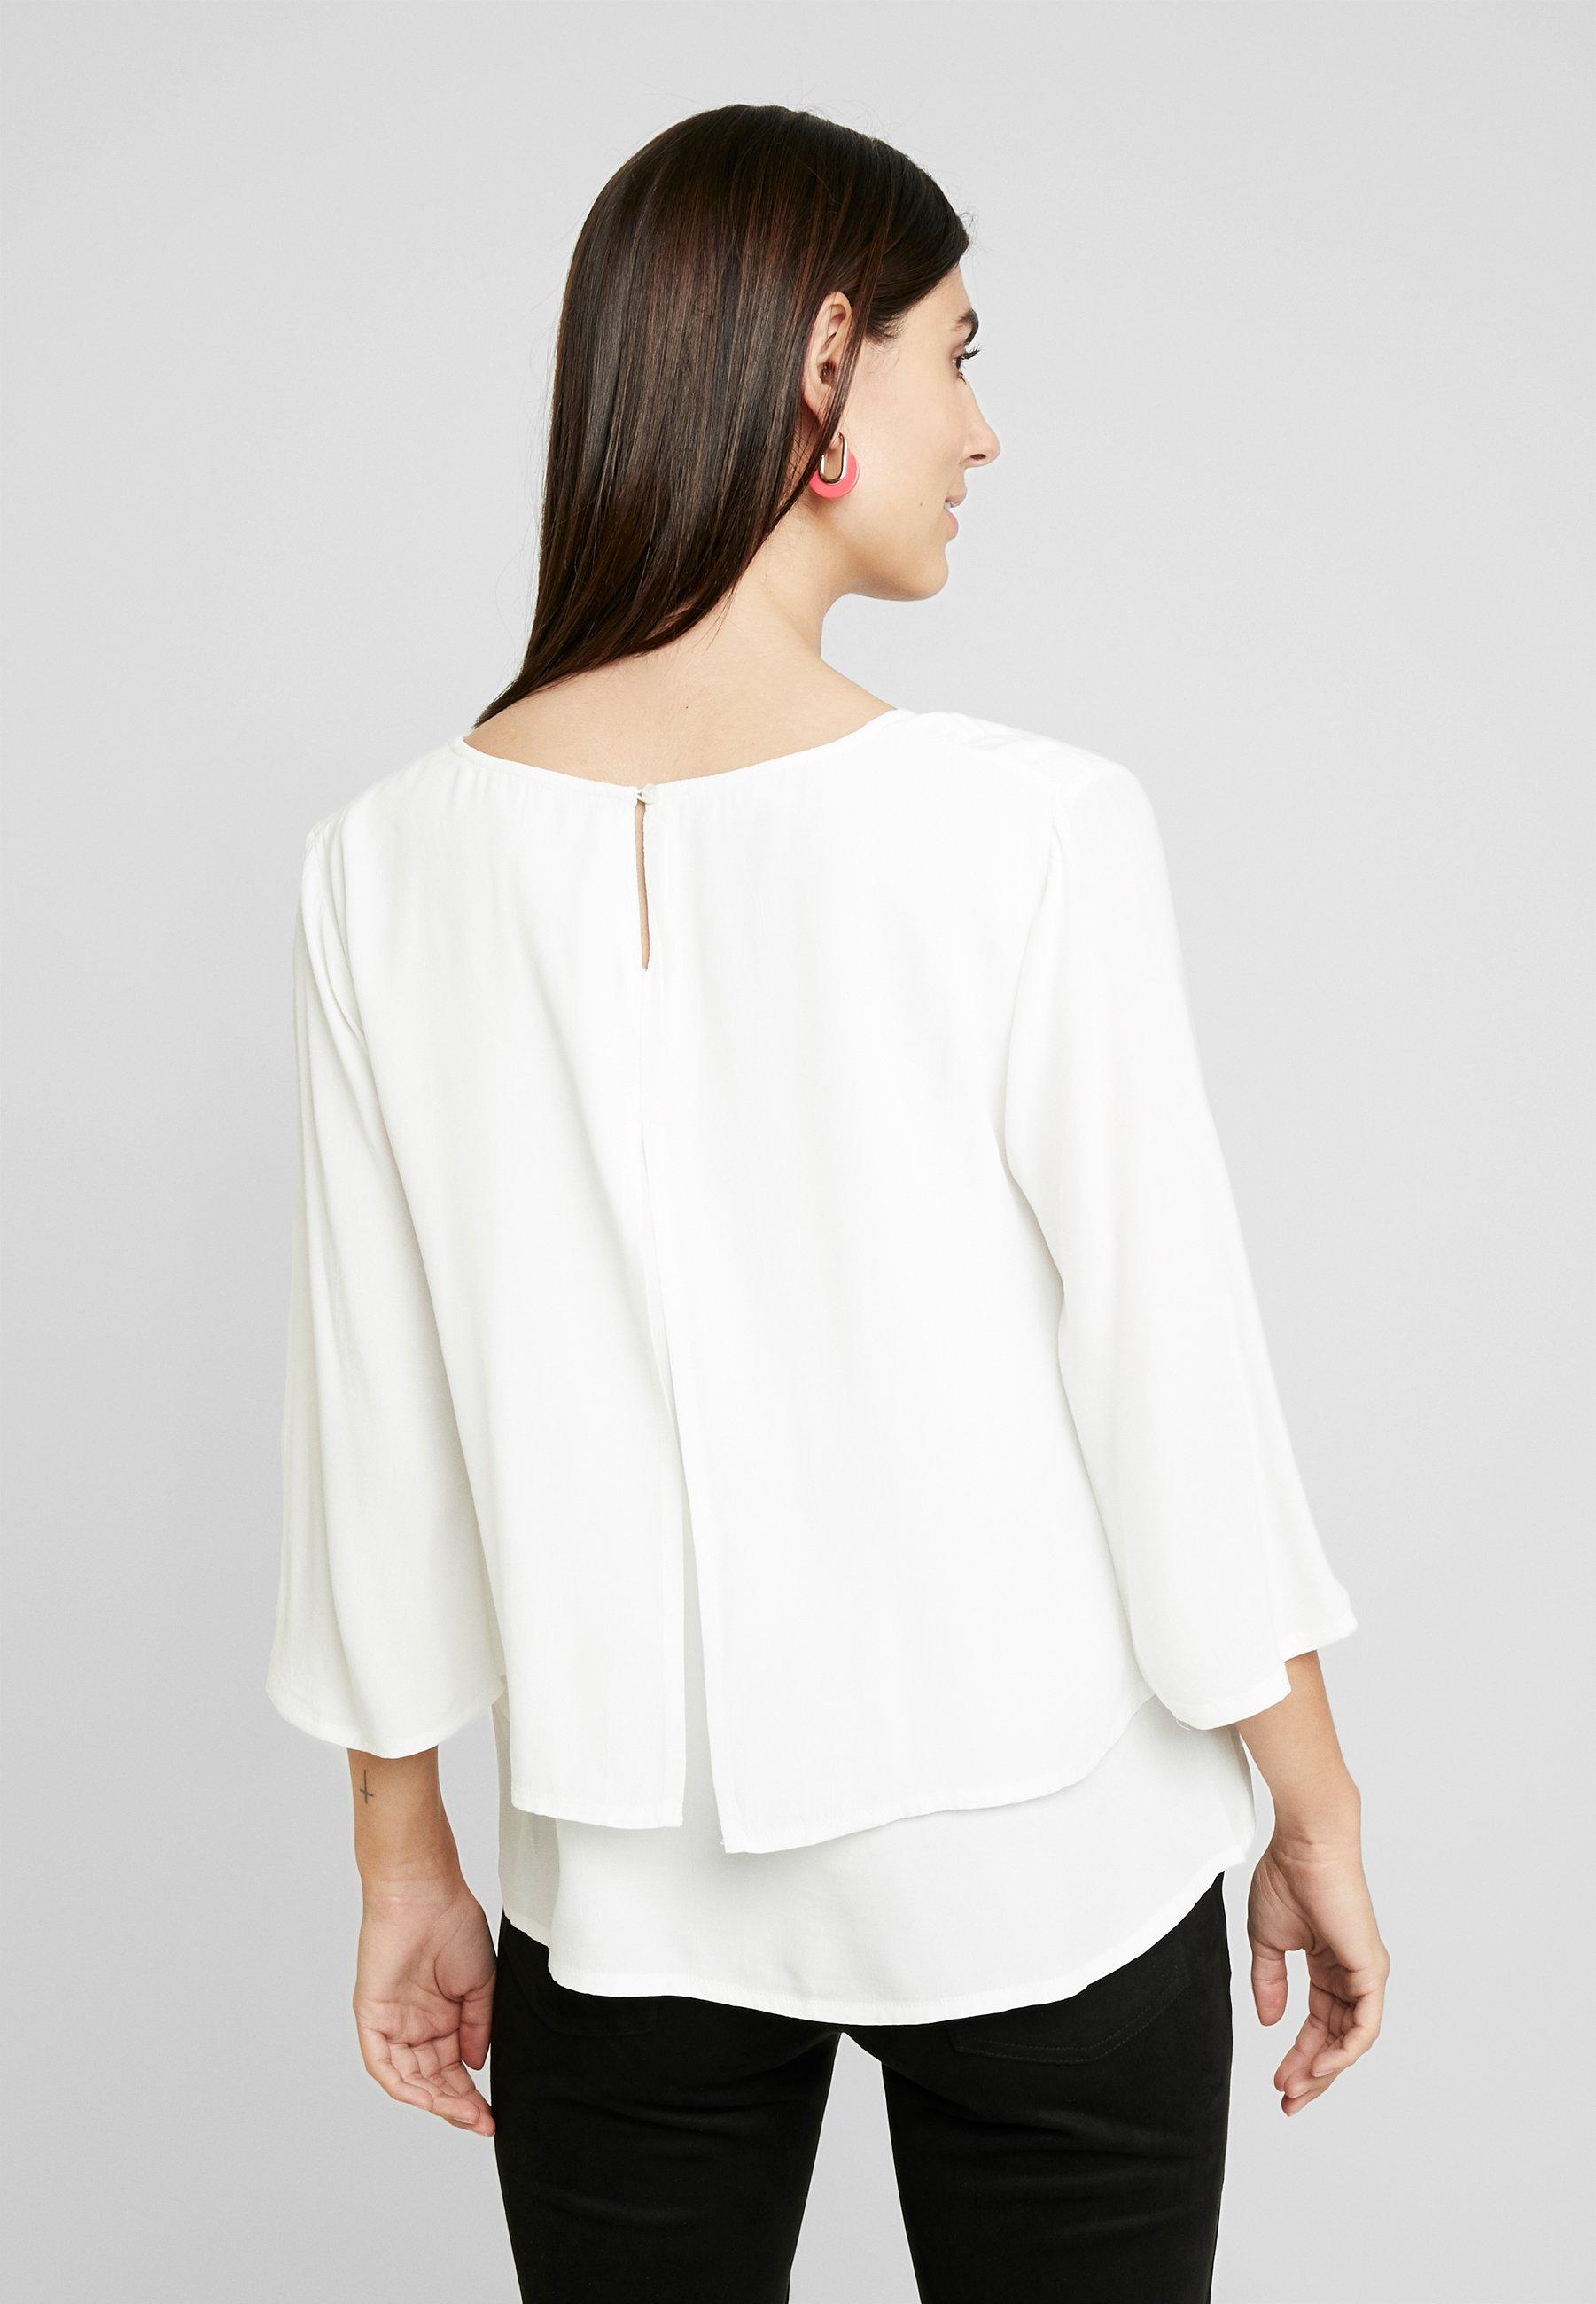 Masai BRYNHILD - Blouse - cream - Tops & T-shirts Femme ZQN4X